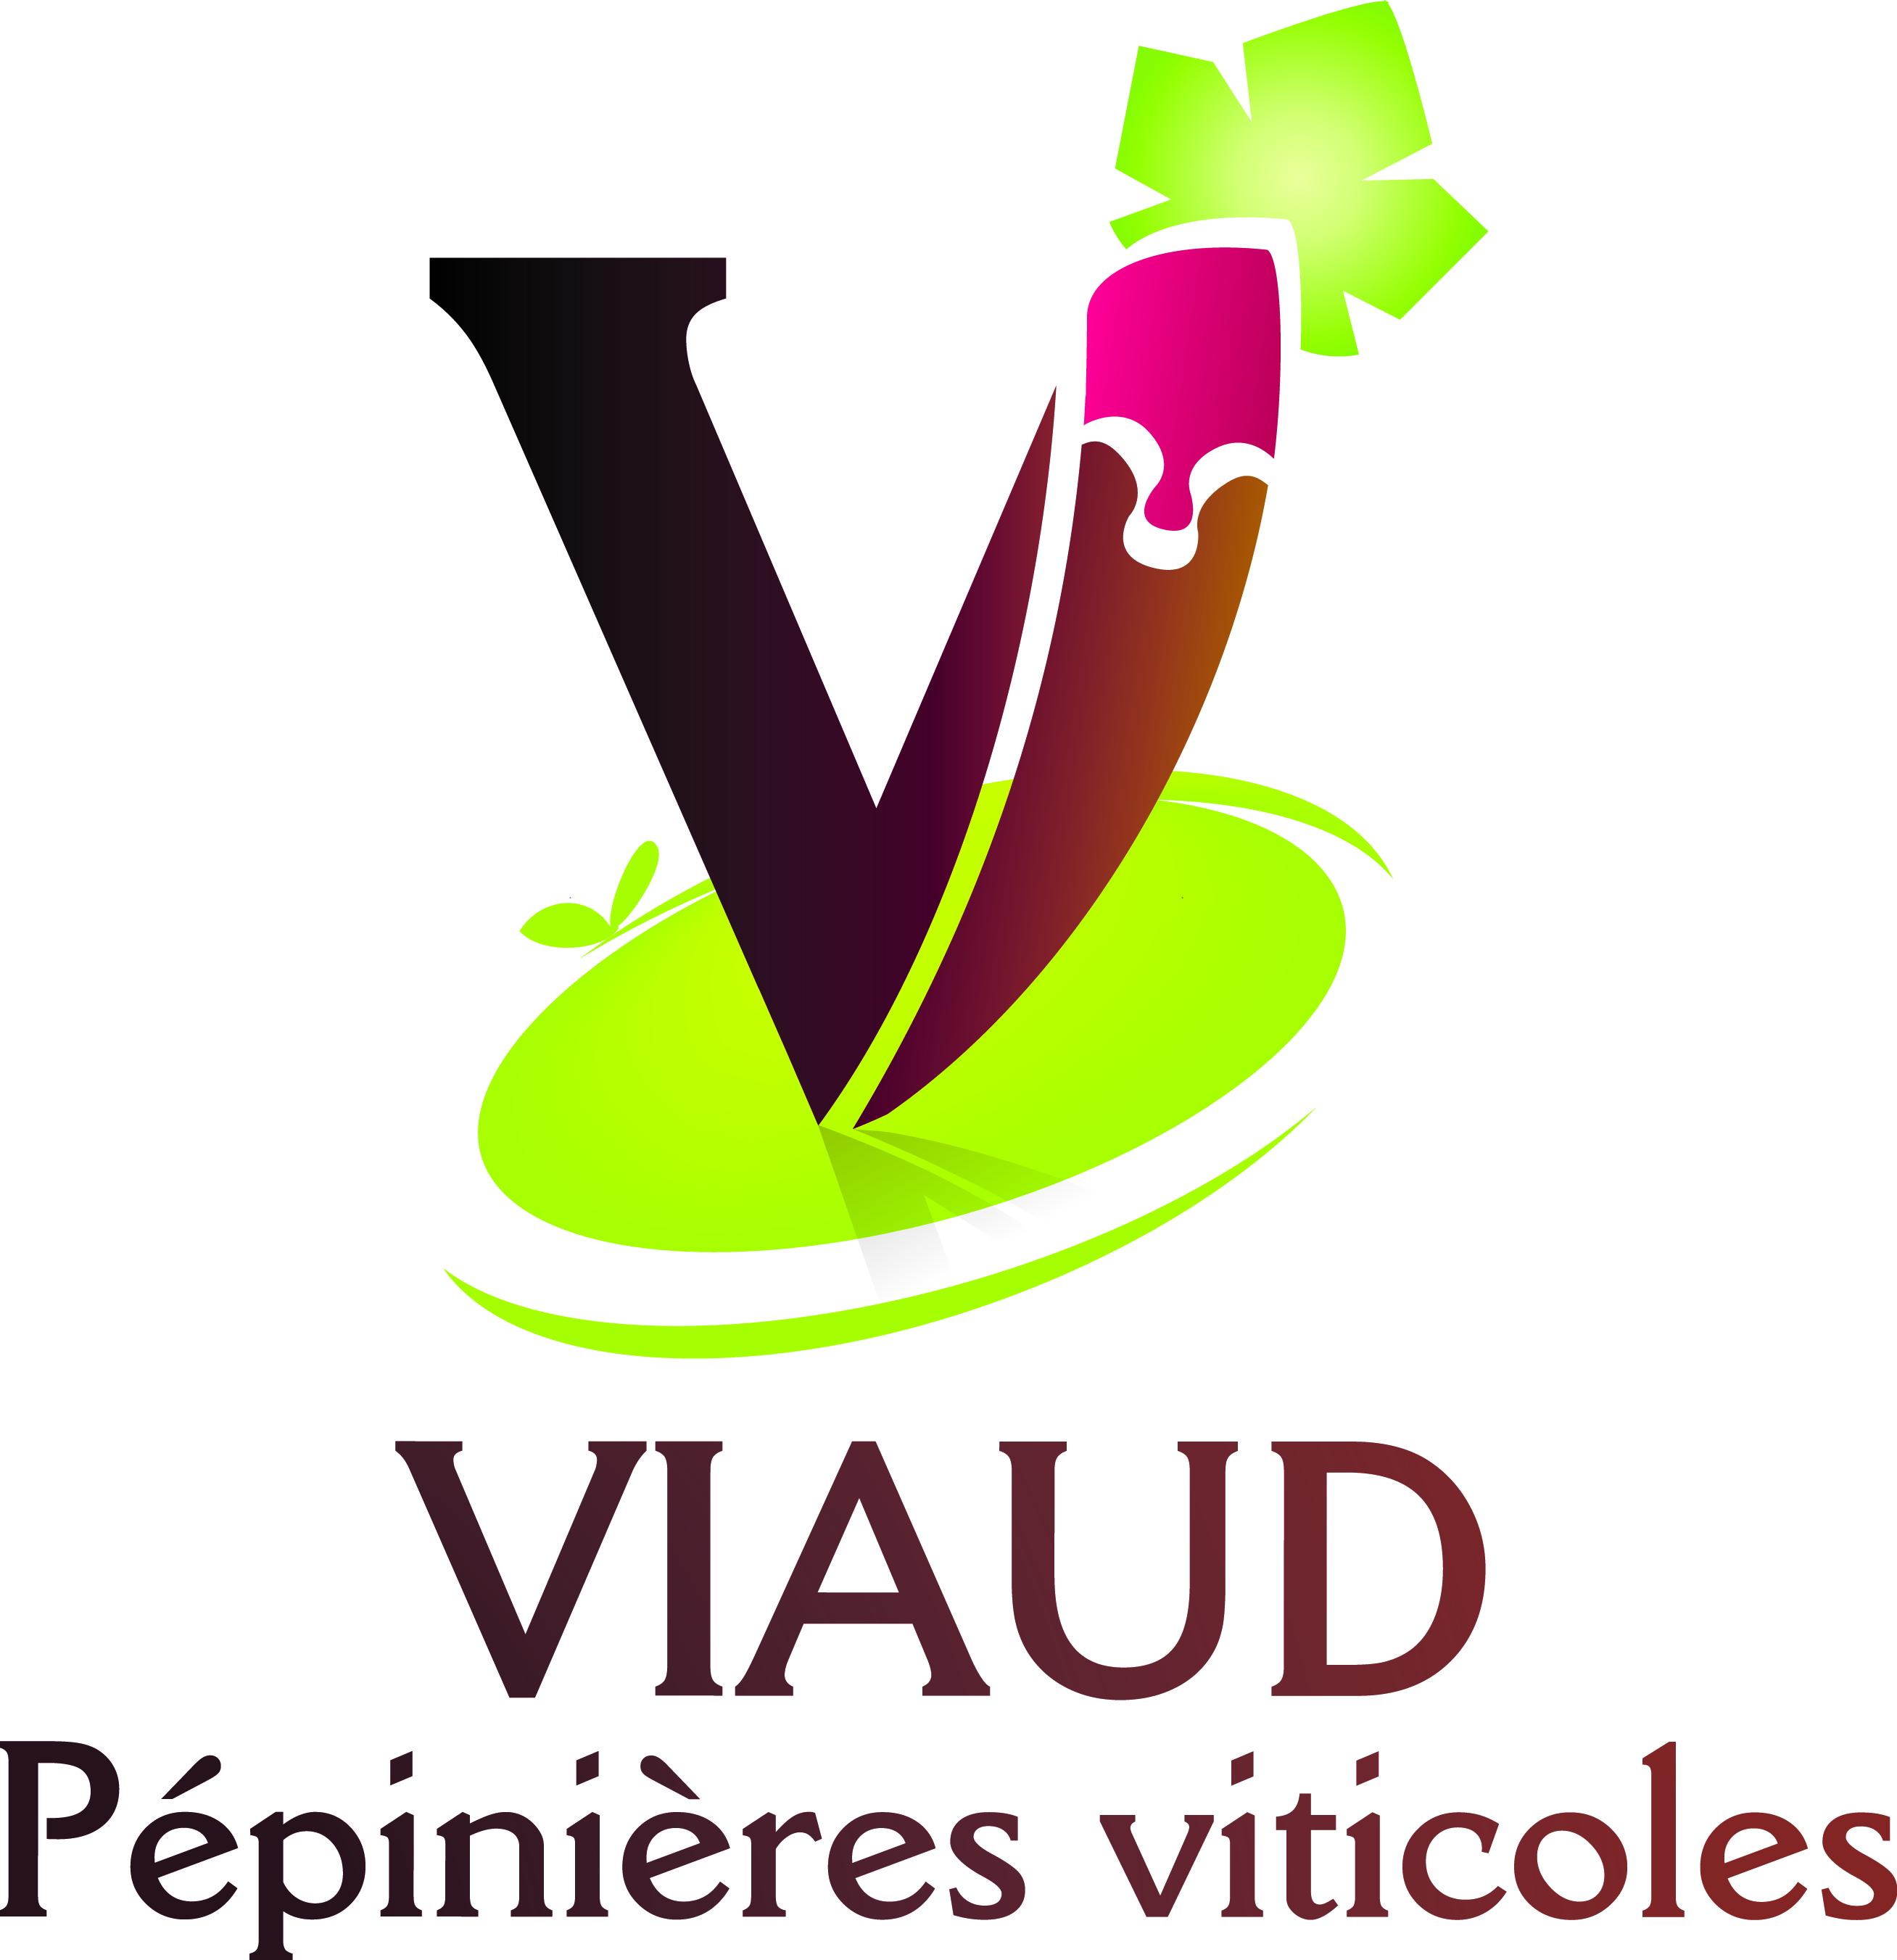 PEPINIERES VITICOLES VIAUD